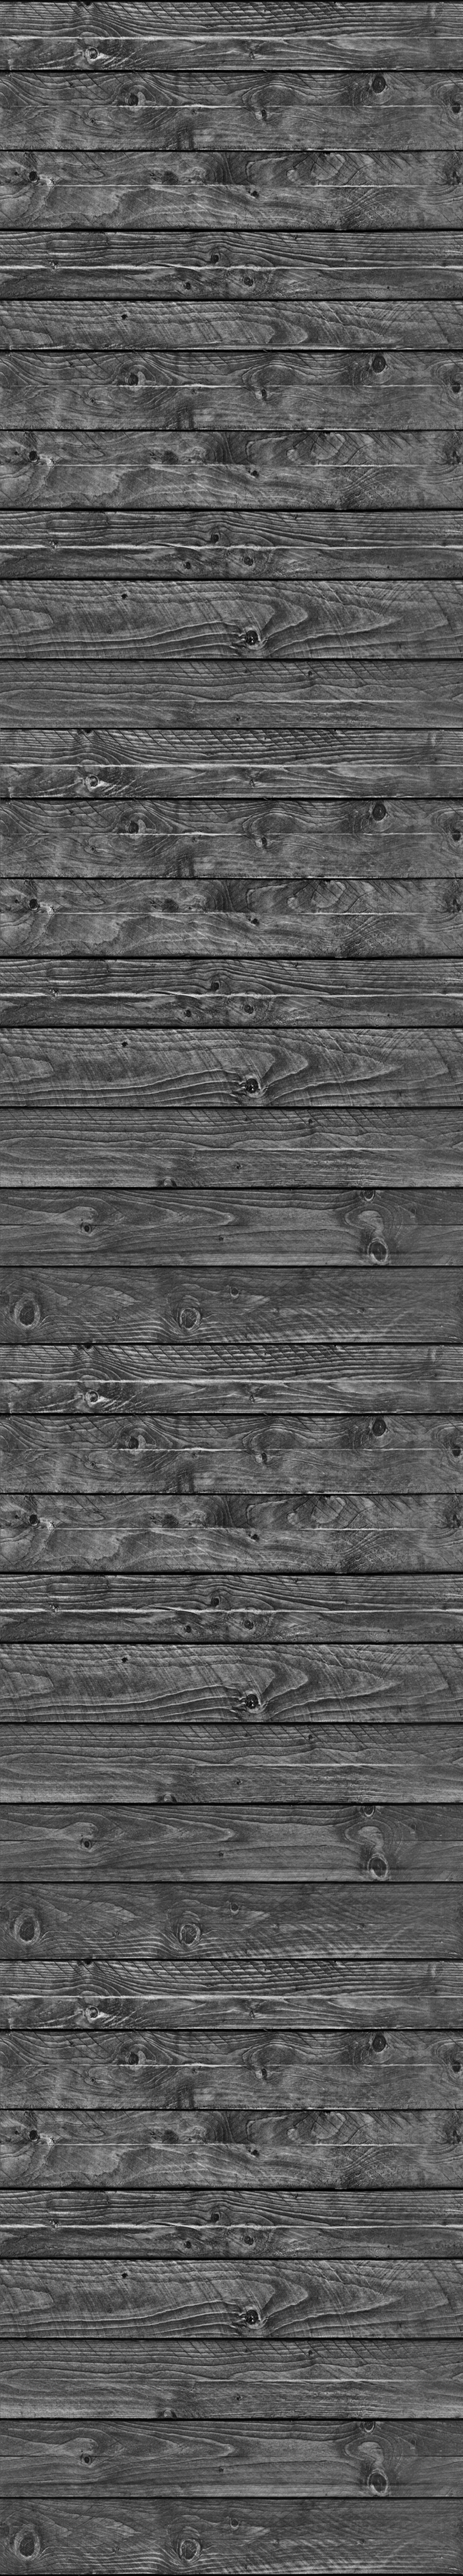 CU Gray Wood Website 3.21.png